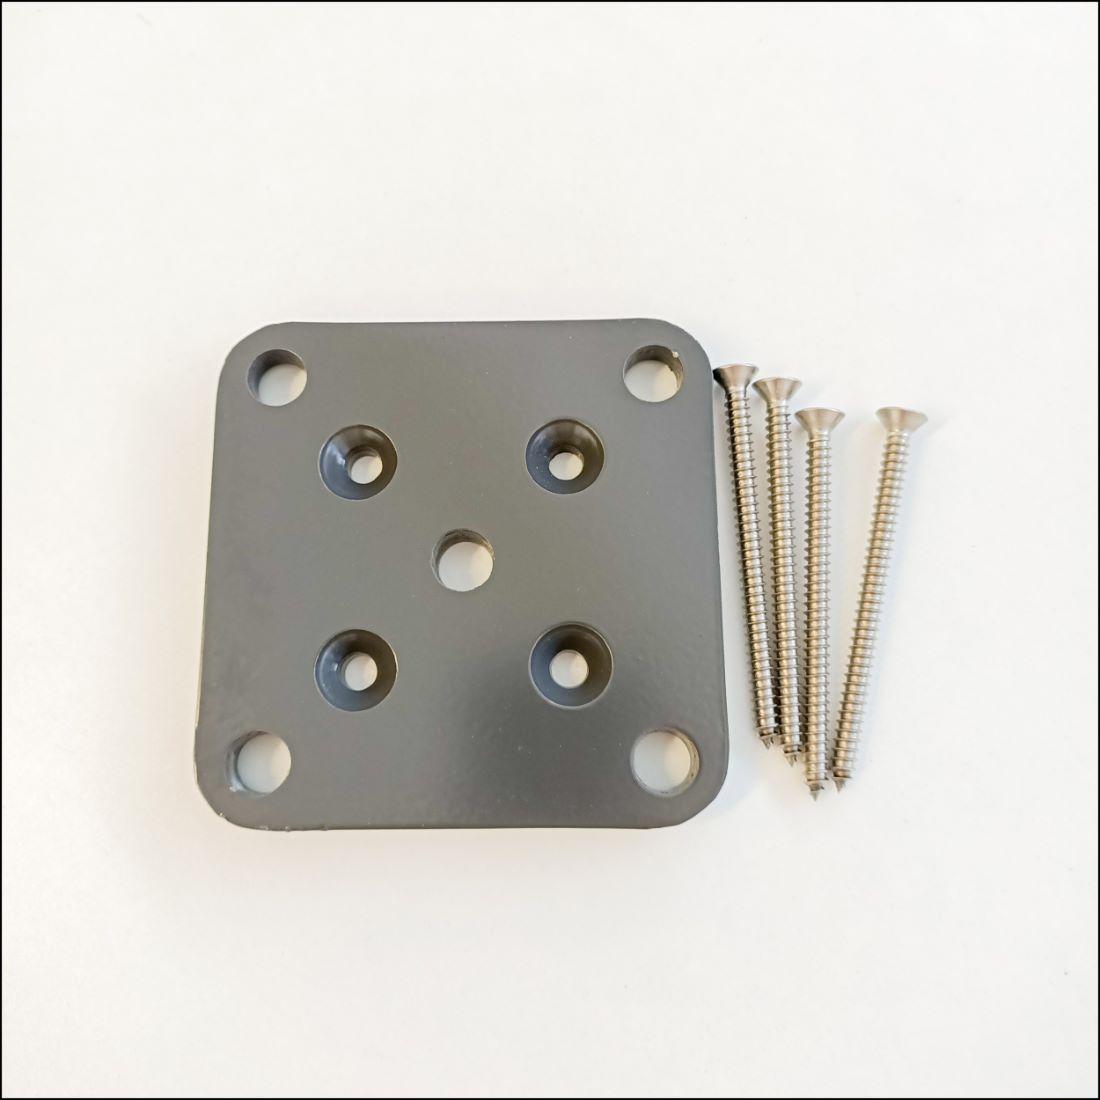 50 x 50mm Base Plate Set Grey